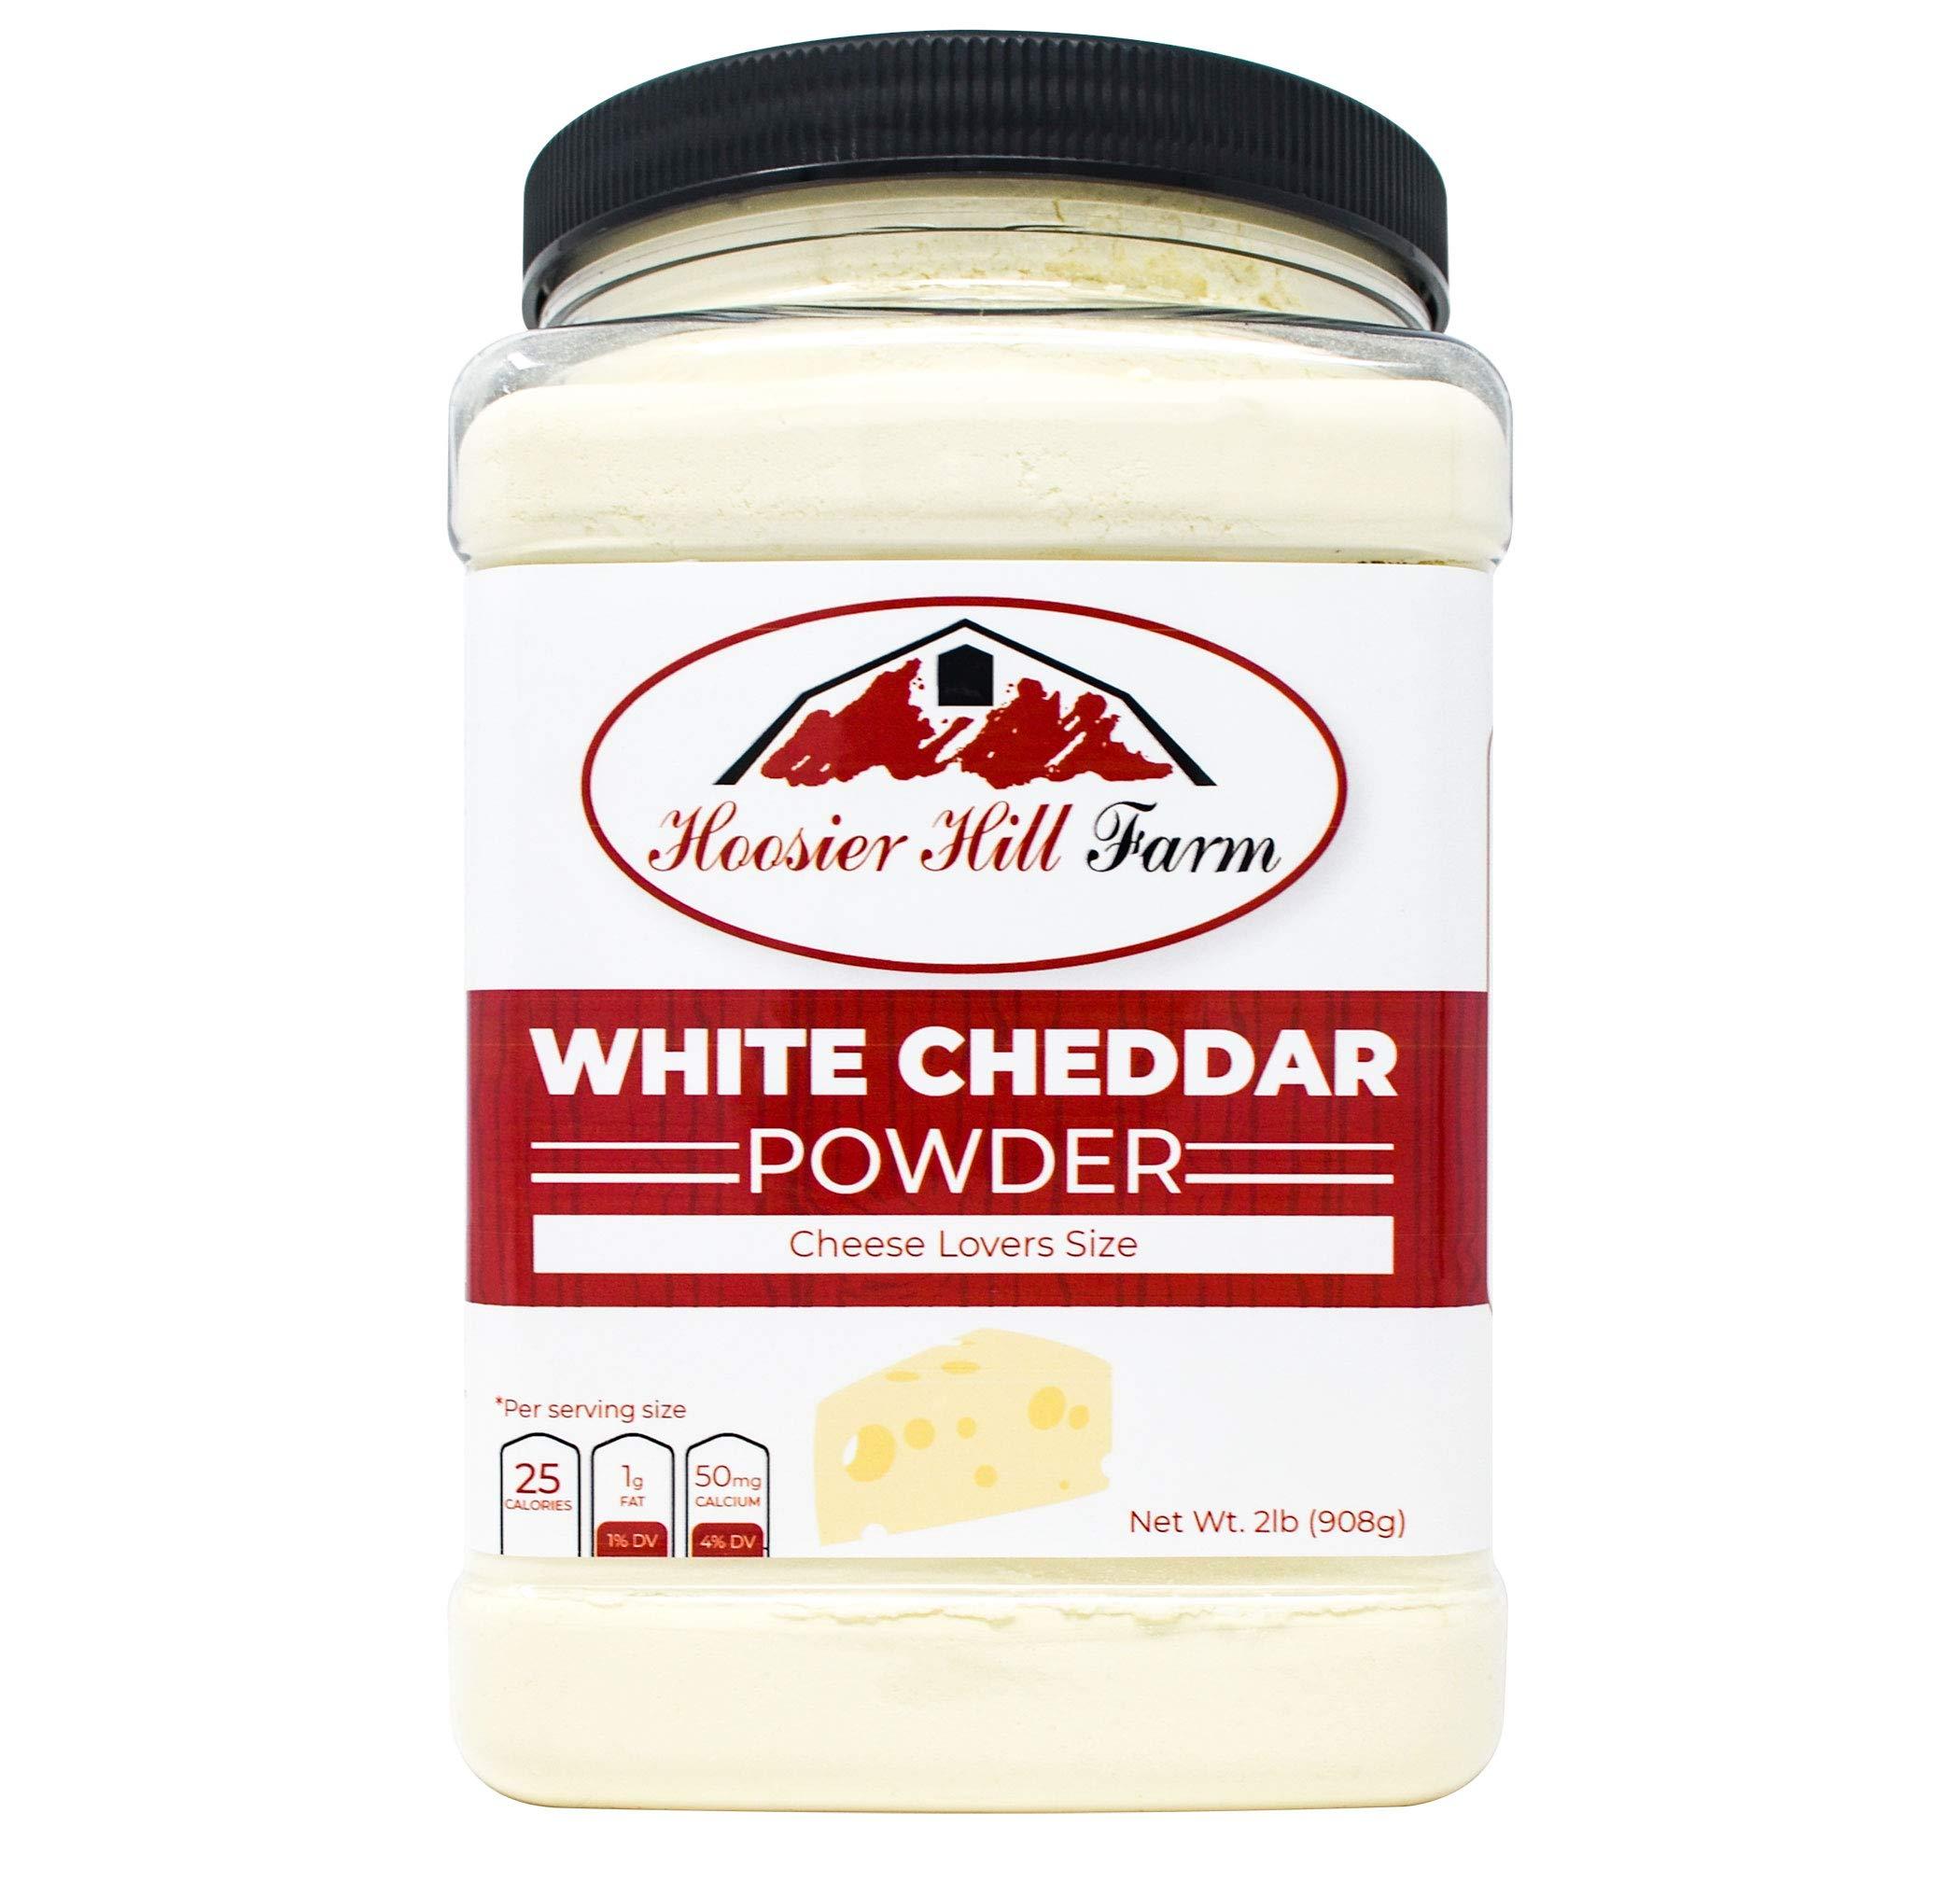 Hoosier Hill Farm White Cheddar Cheese Powder, Cheese Lovers, 2 Pound by Hoosier Hill Farm